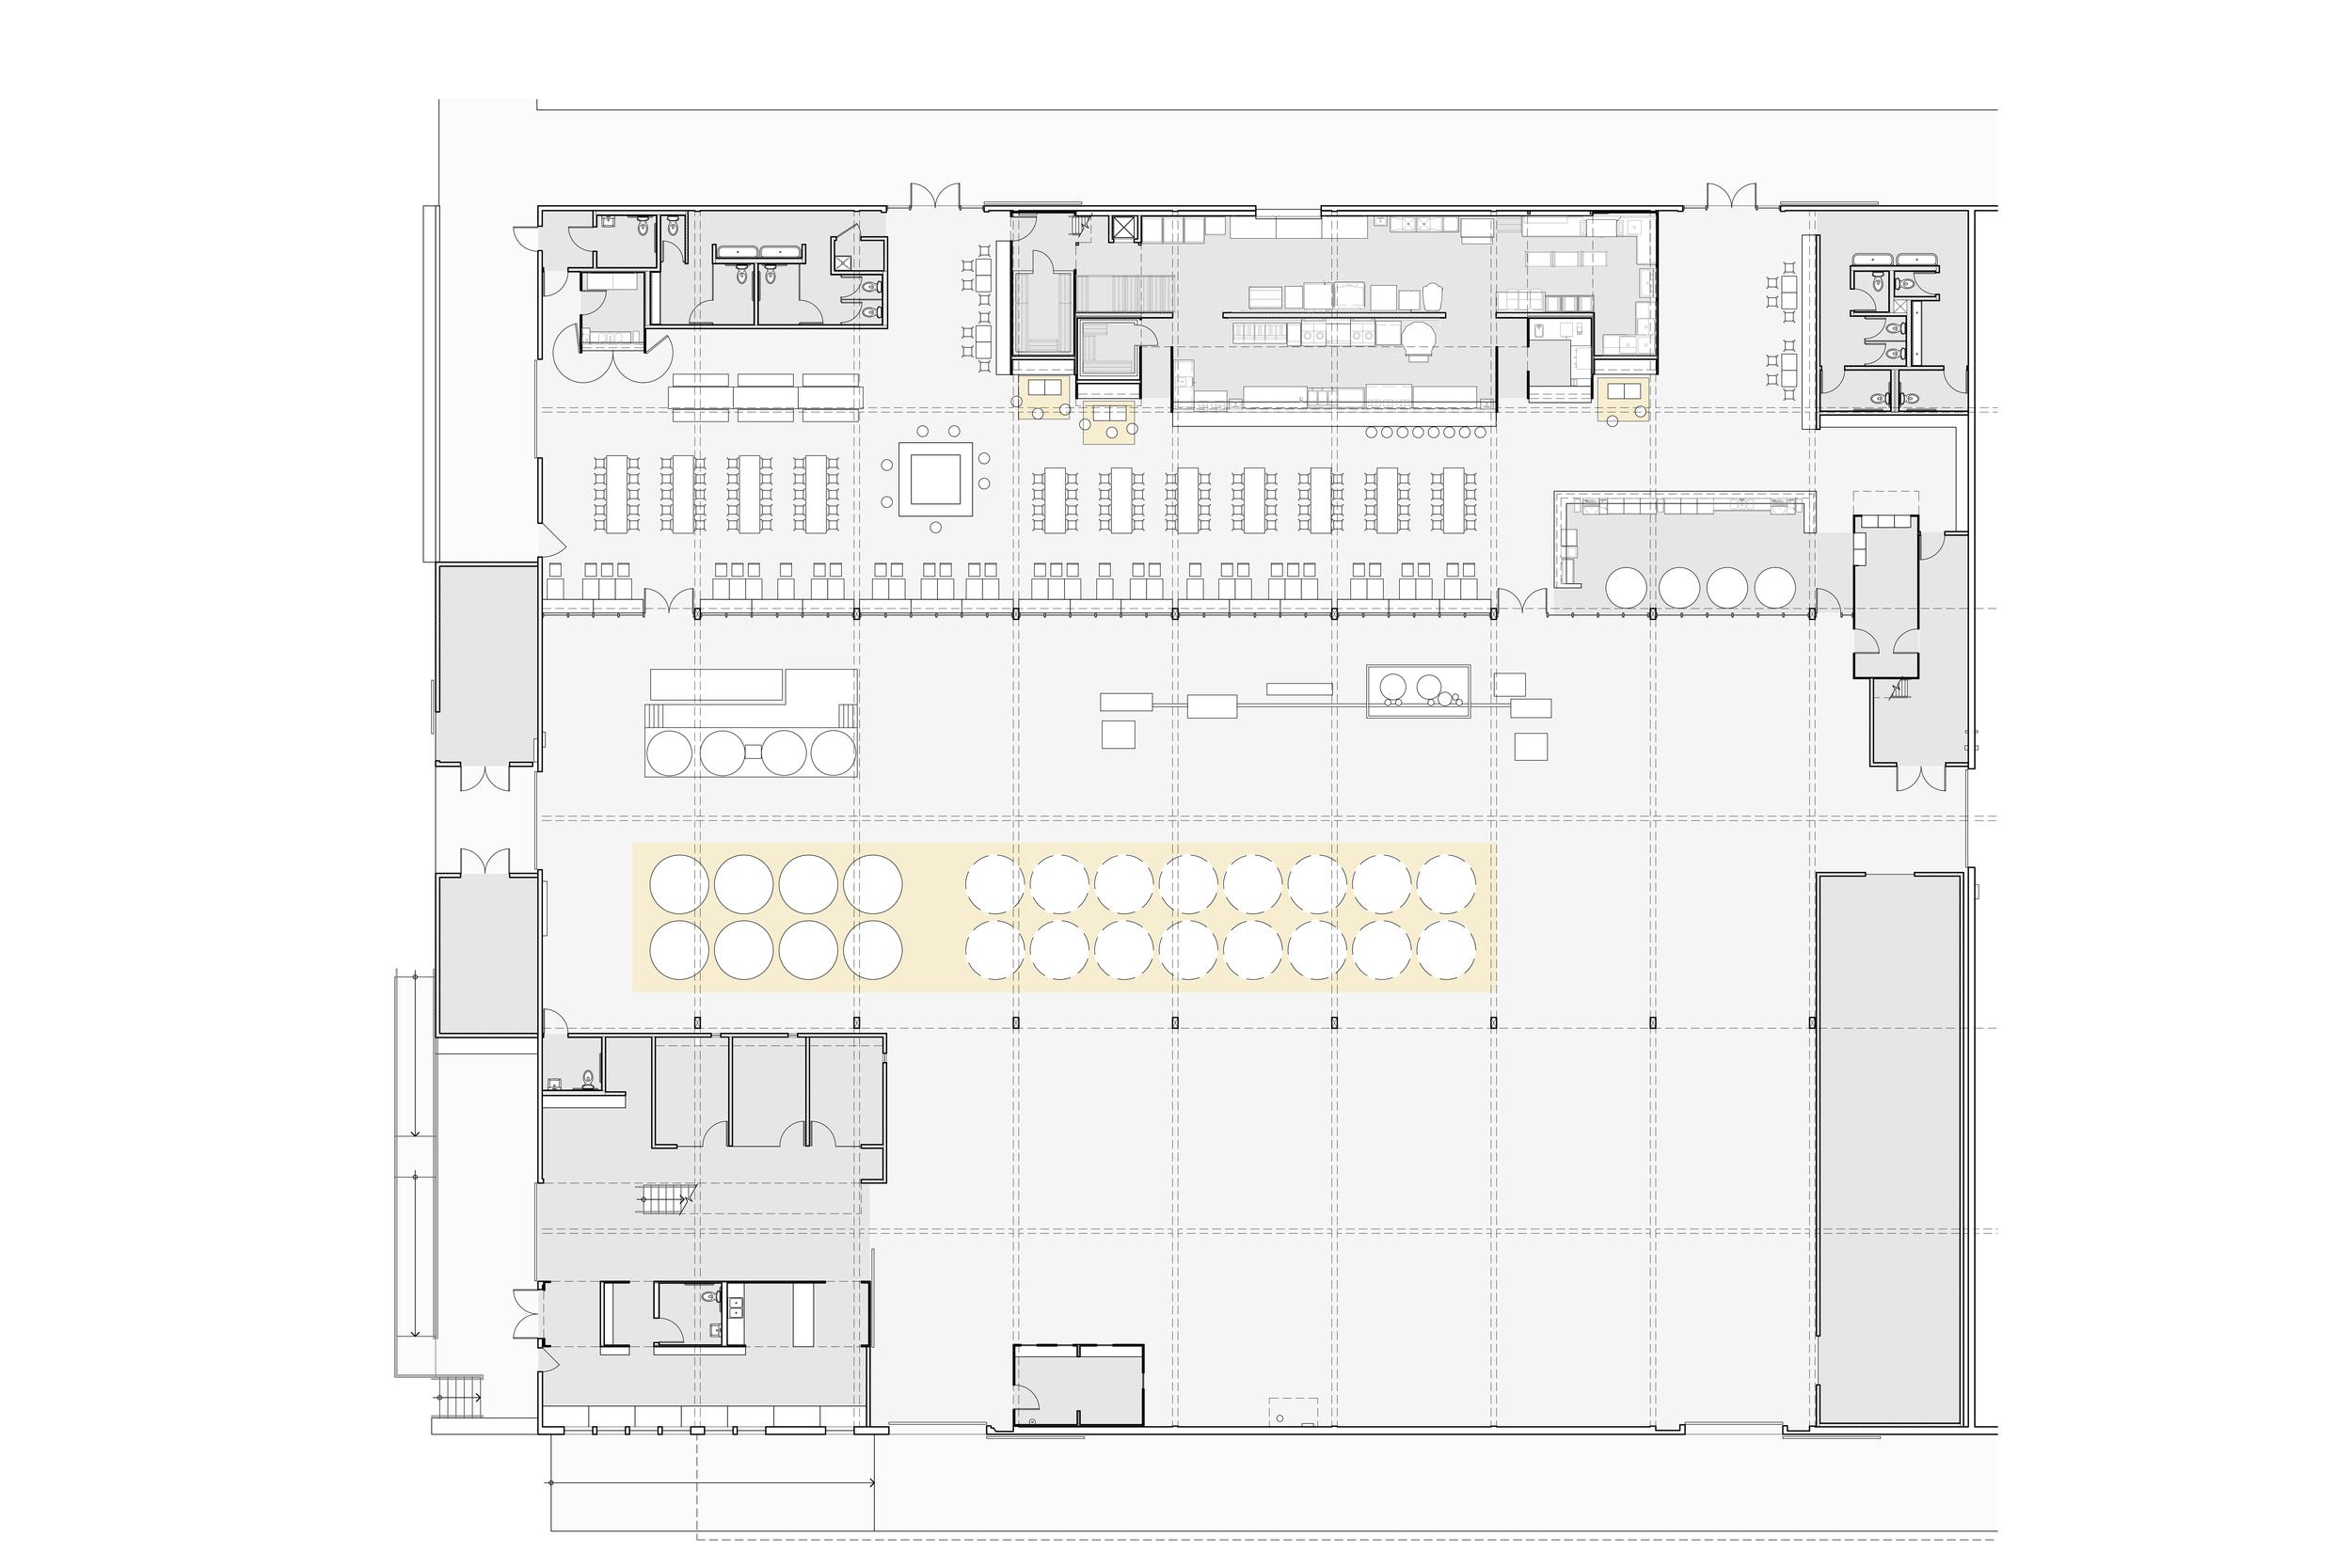 13-19 Colored Plan.jpg